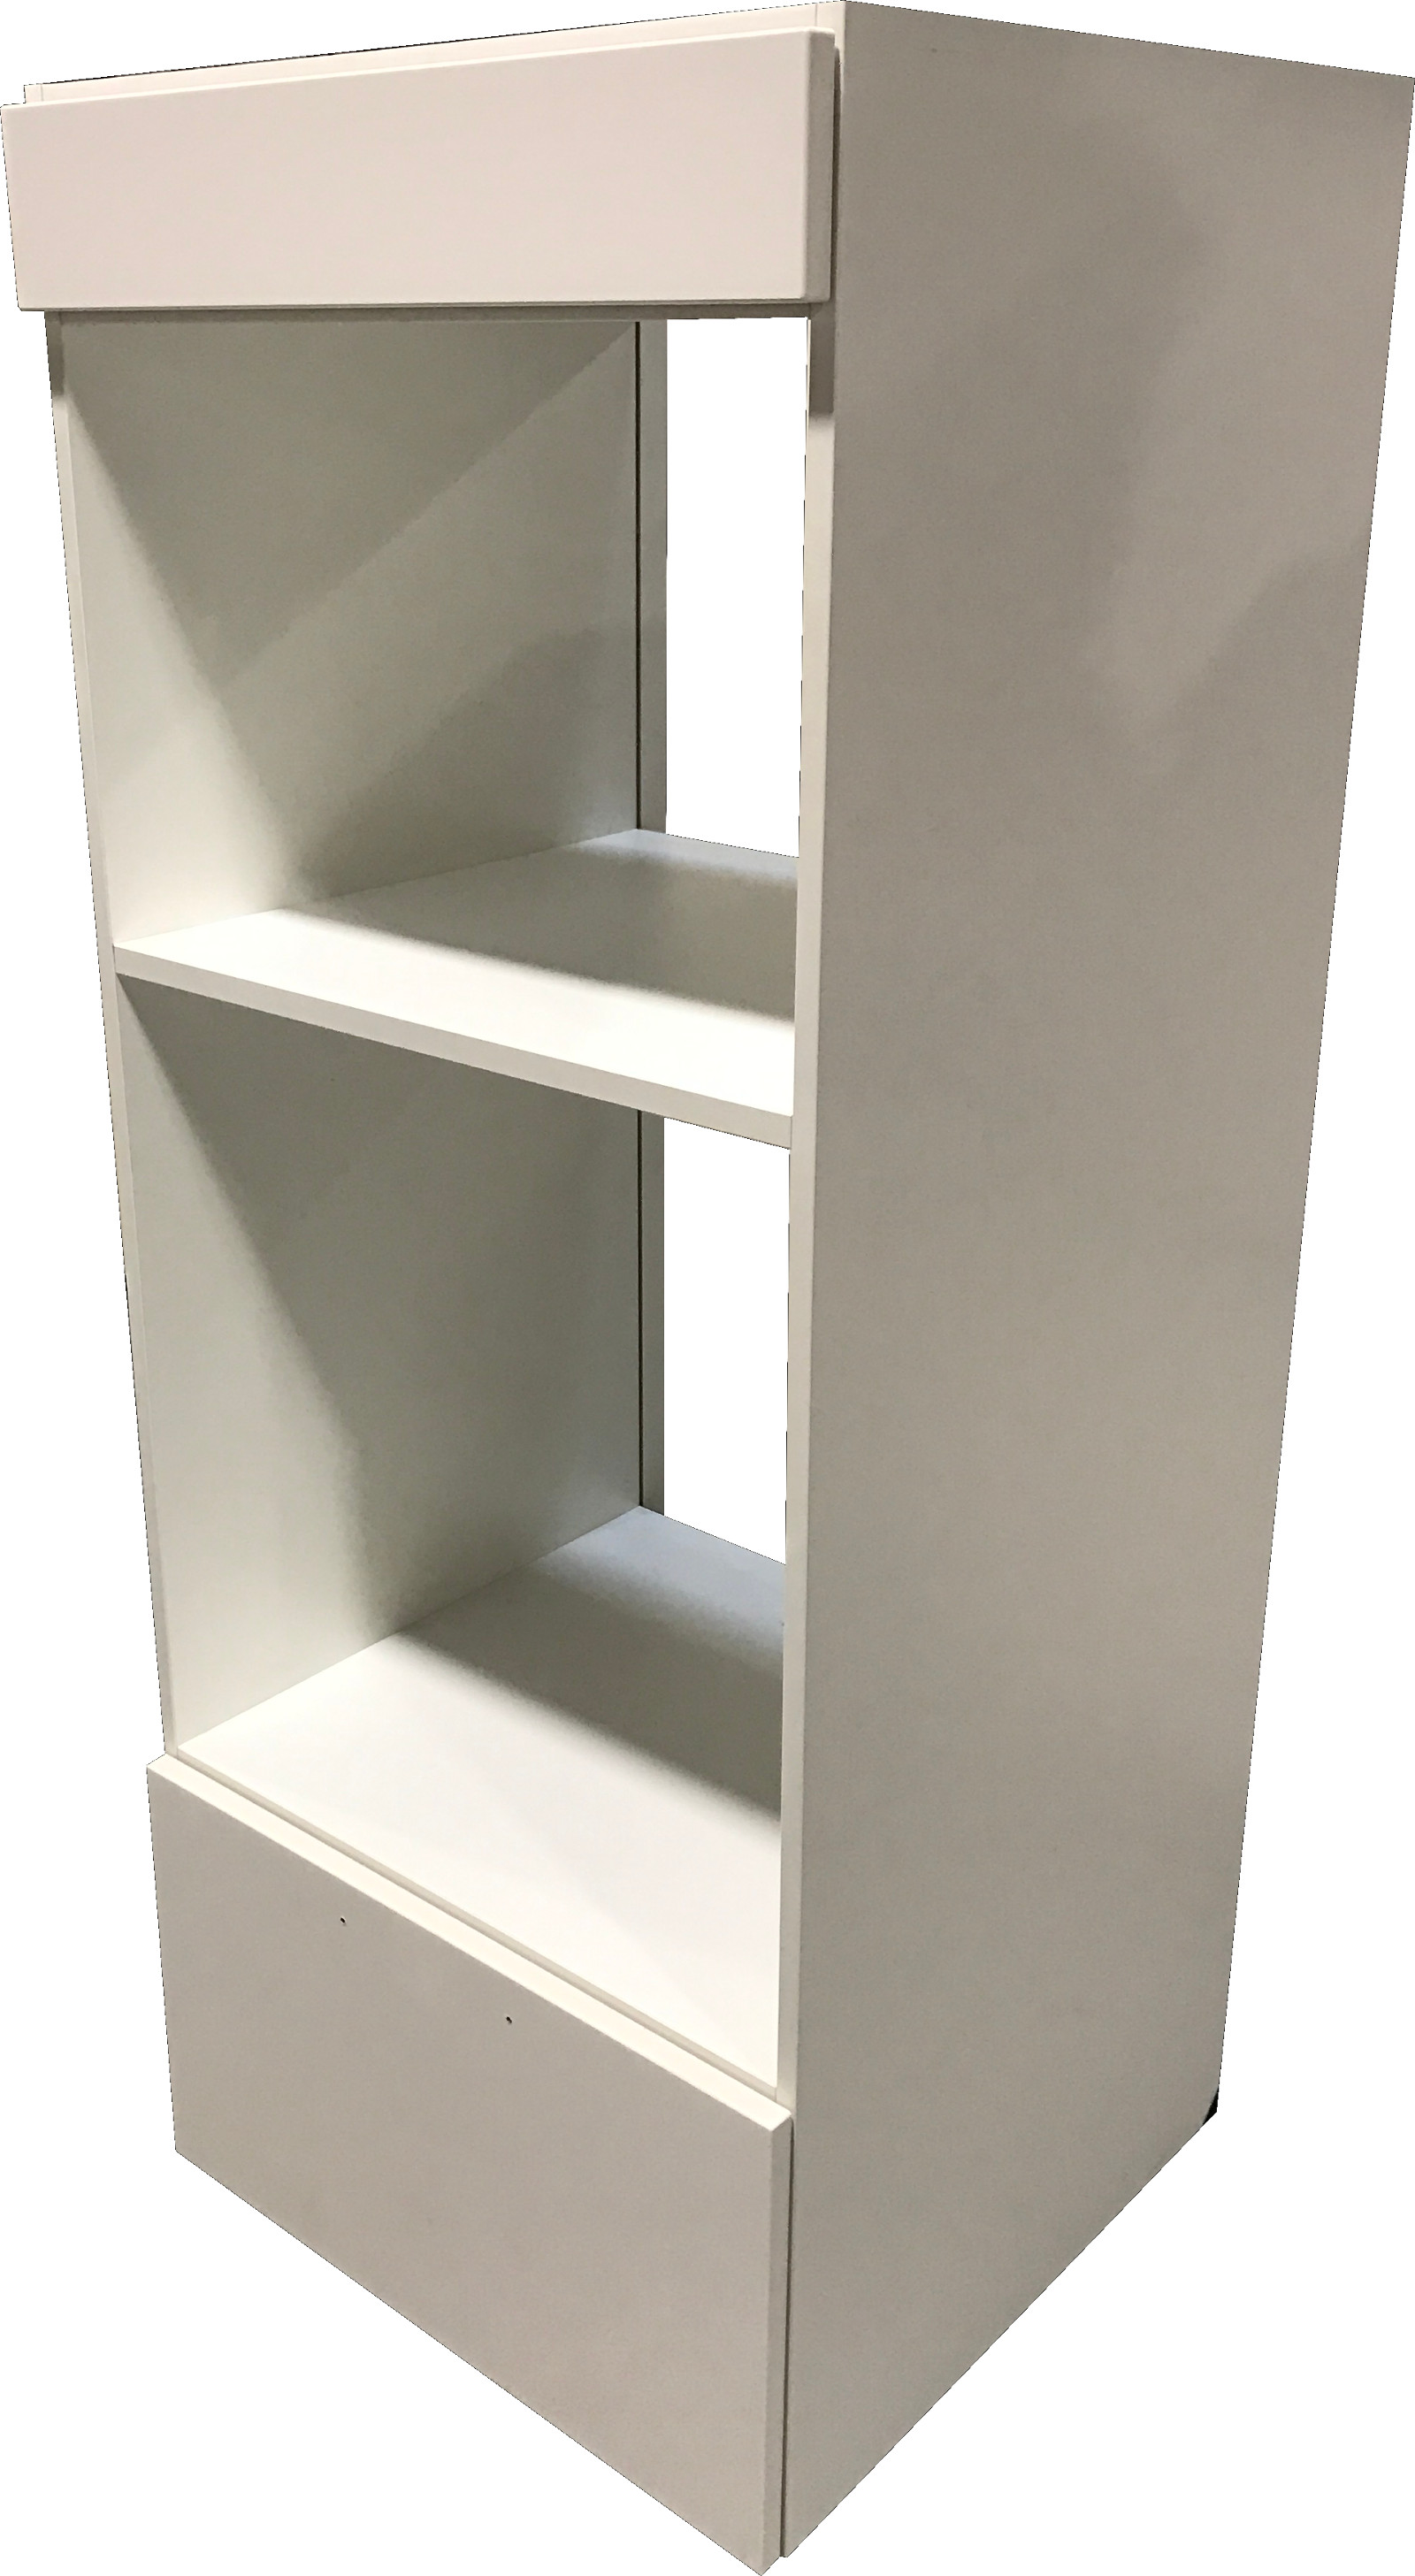 highboard f r int k hlschrank umbauschrank k che ausstellungsst ck ebay. Black Bedroom Furniture Sets. Home Design Ideas